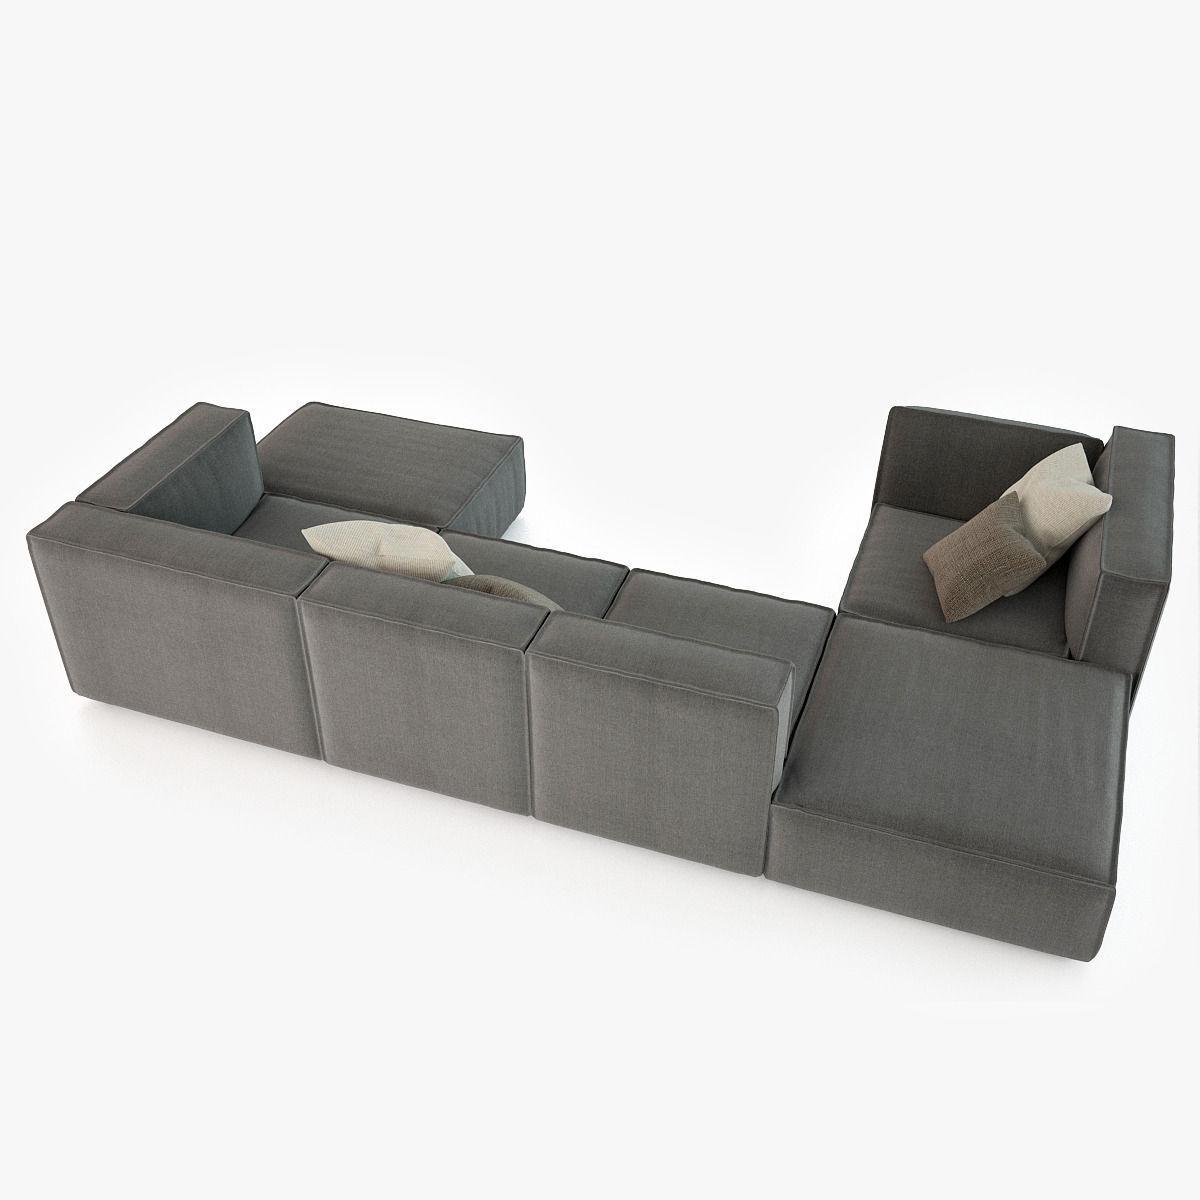 calia italia richard sofa collection 3d model max obj fbx. Black Bedroom Furniture Sets. Home Design Ideas